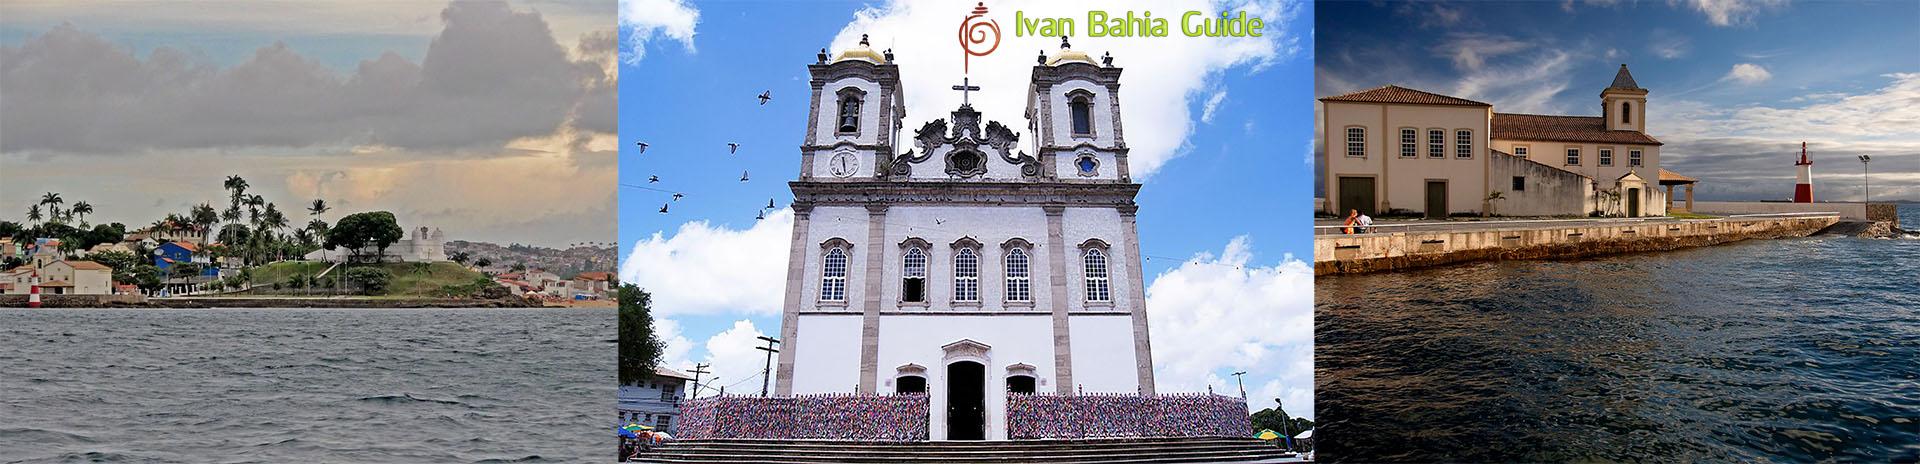 visit Salvador da Bahia with Ivan Bahia Guide / Photography by #IvanBahiaGuide ref., #ToursByLocals, #fernandobingre, @fernandobingre